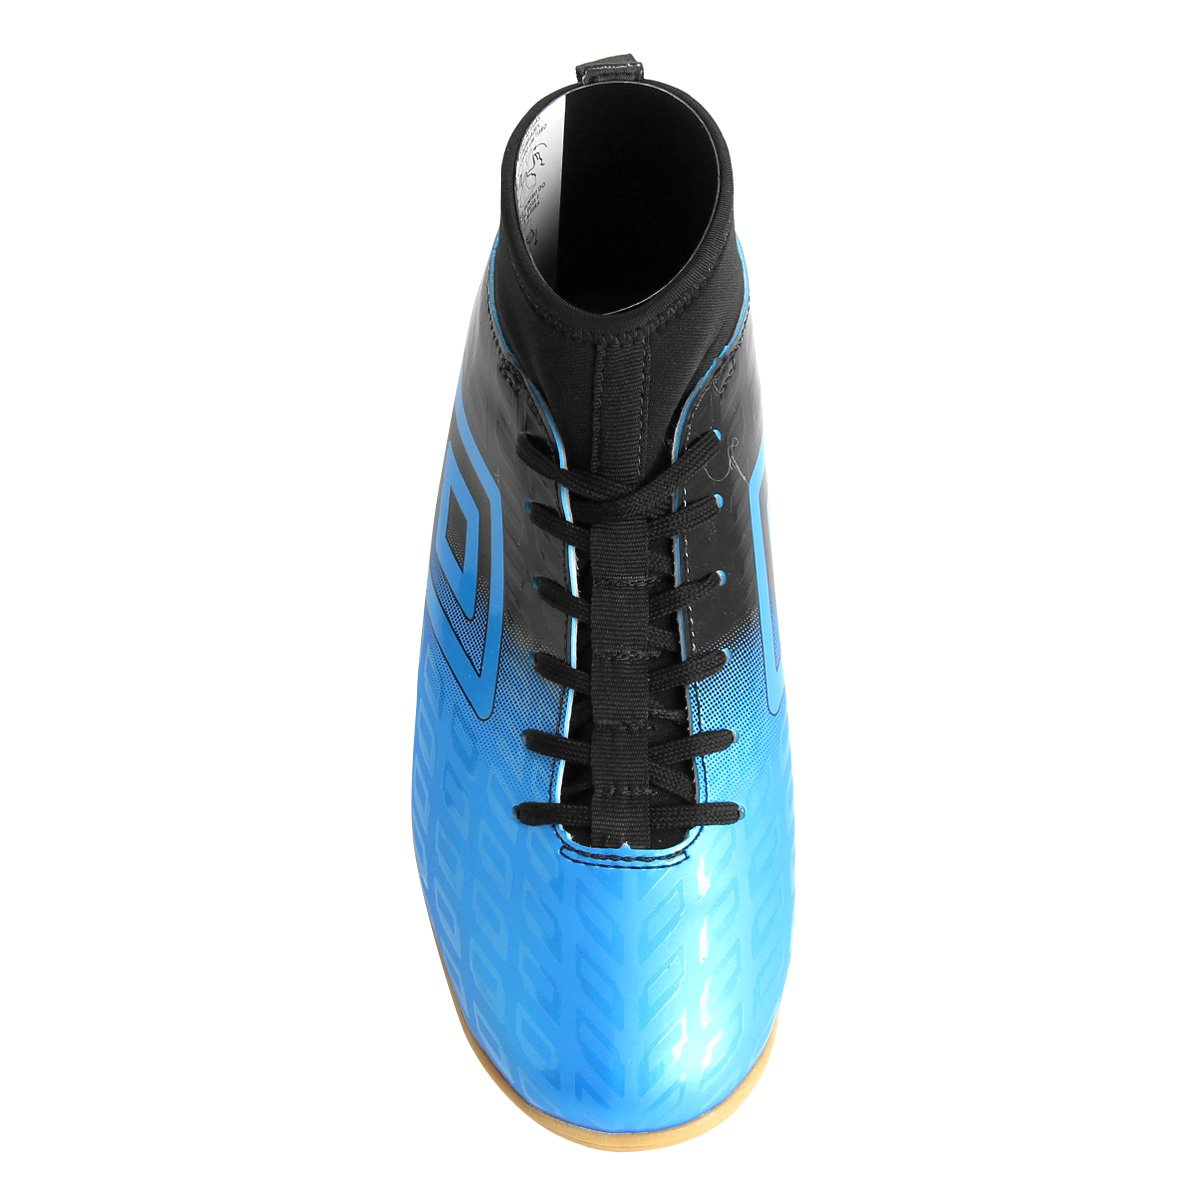 430f8e834f Chuteira Futsal Umbro Calibra - Azul e Preto - Compre Agora